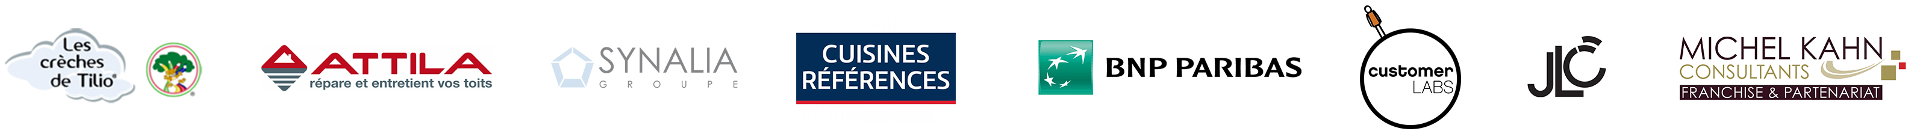 20200709 - Logo participant - IREF - UL